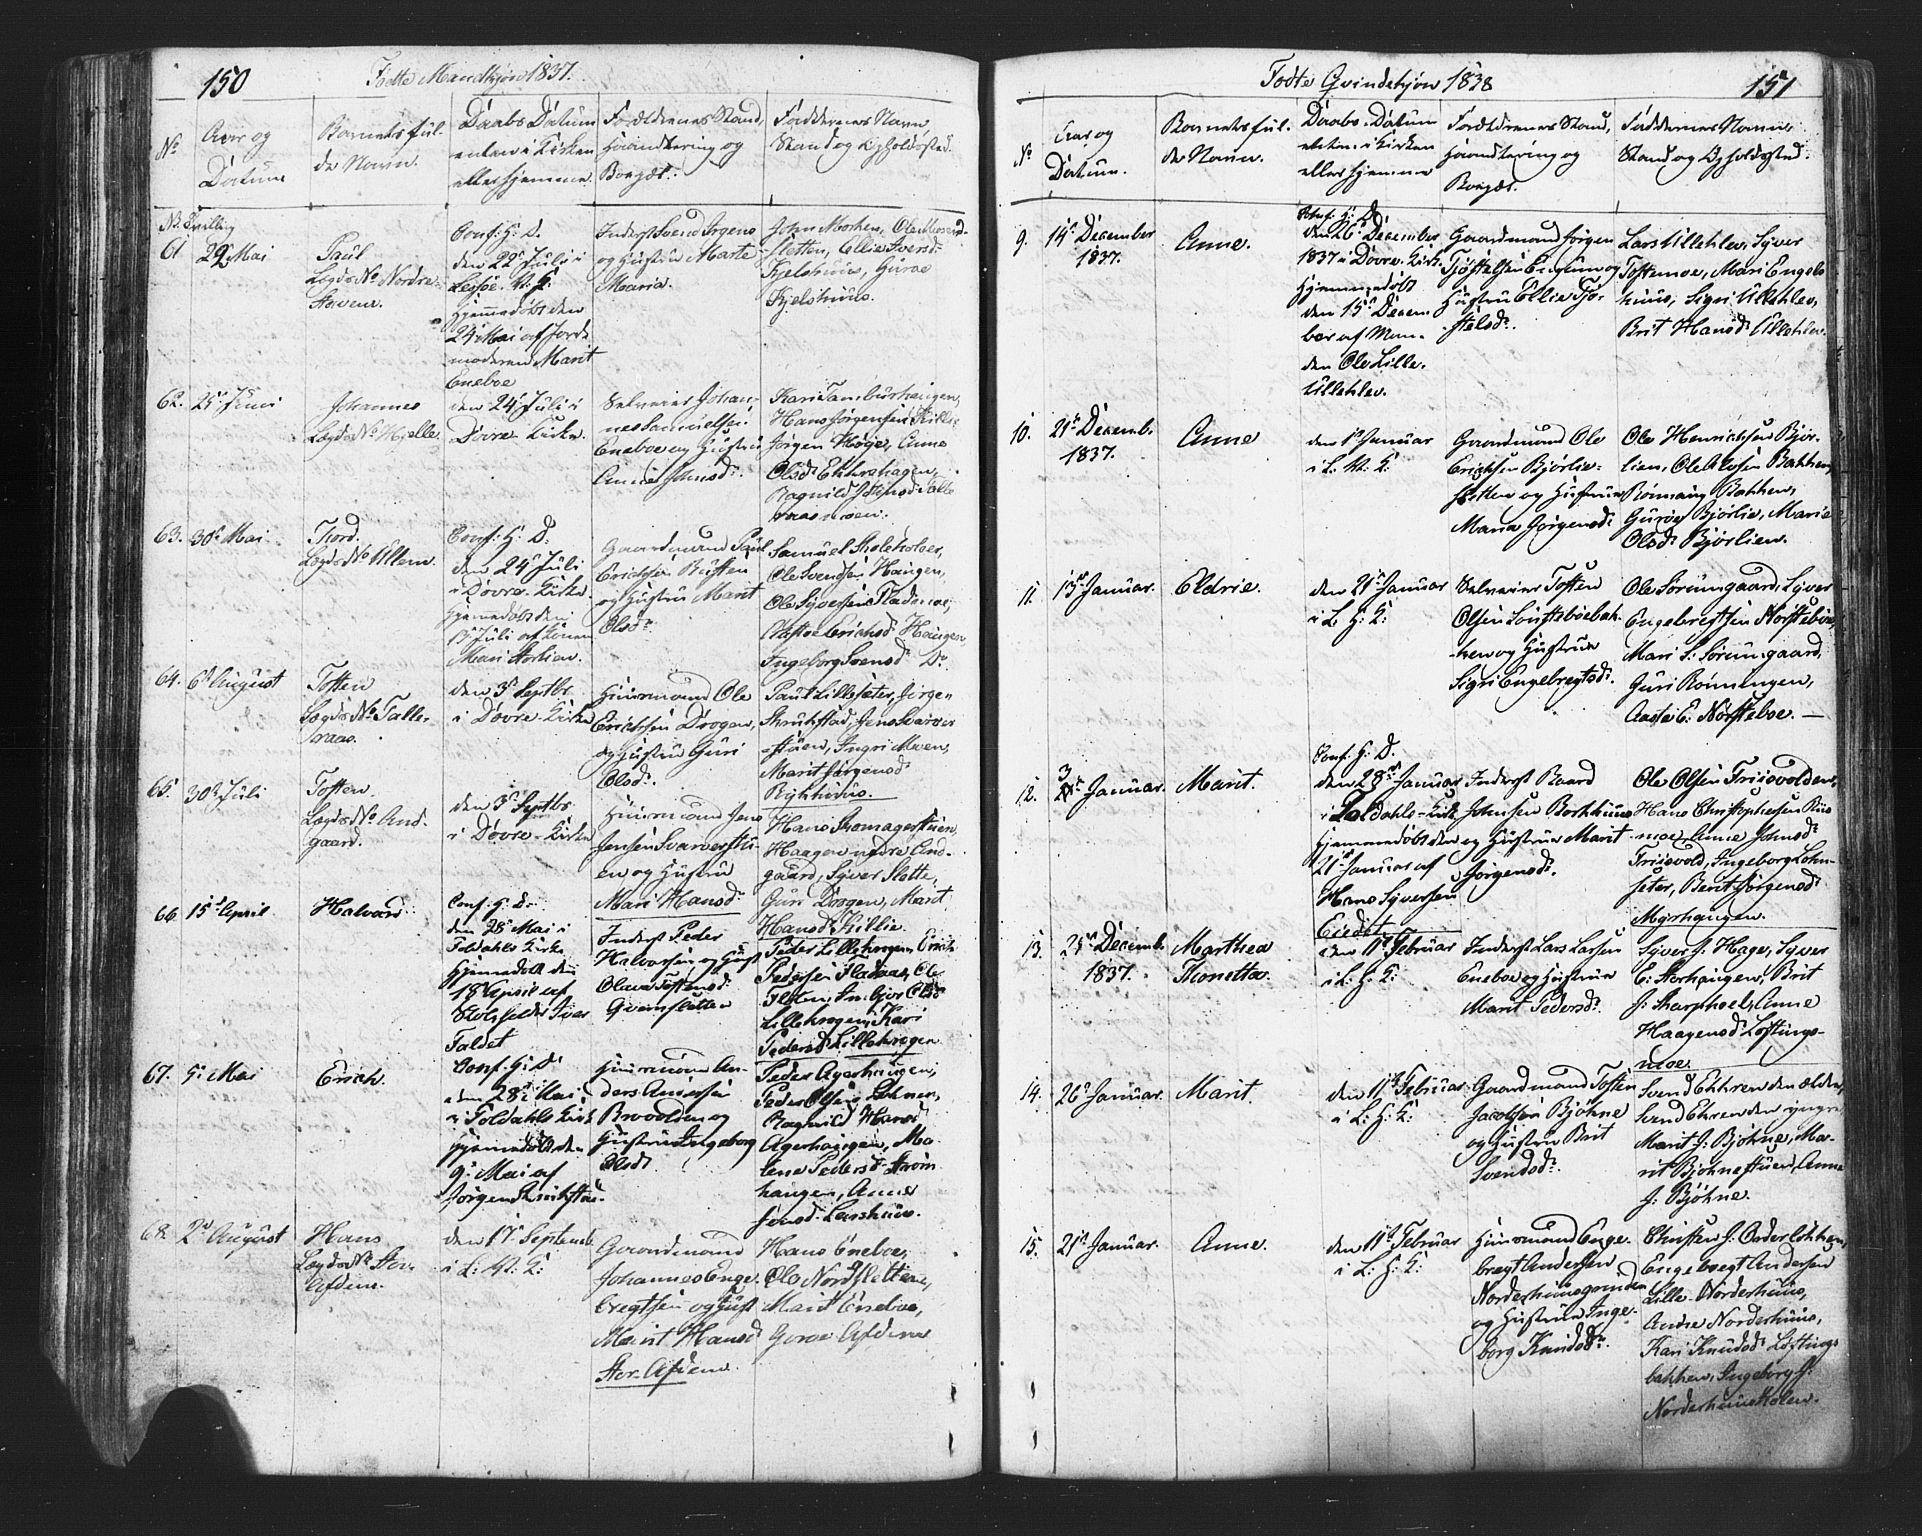 SAH, Lesja prestekontor, Klokkerbok nr. 2, 1832-1850, s. 150-151